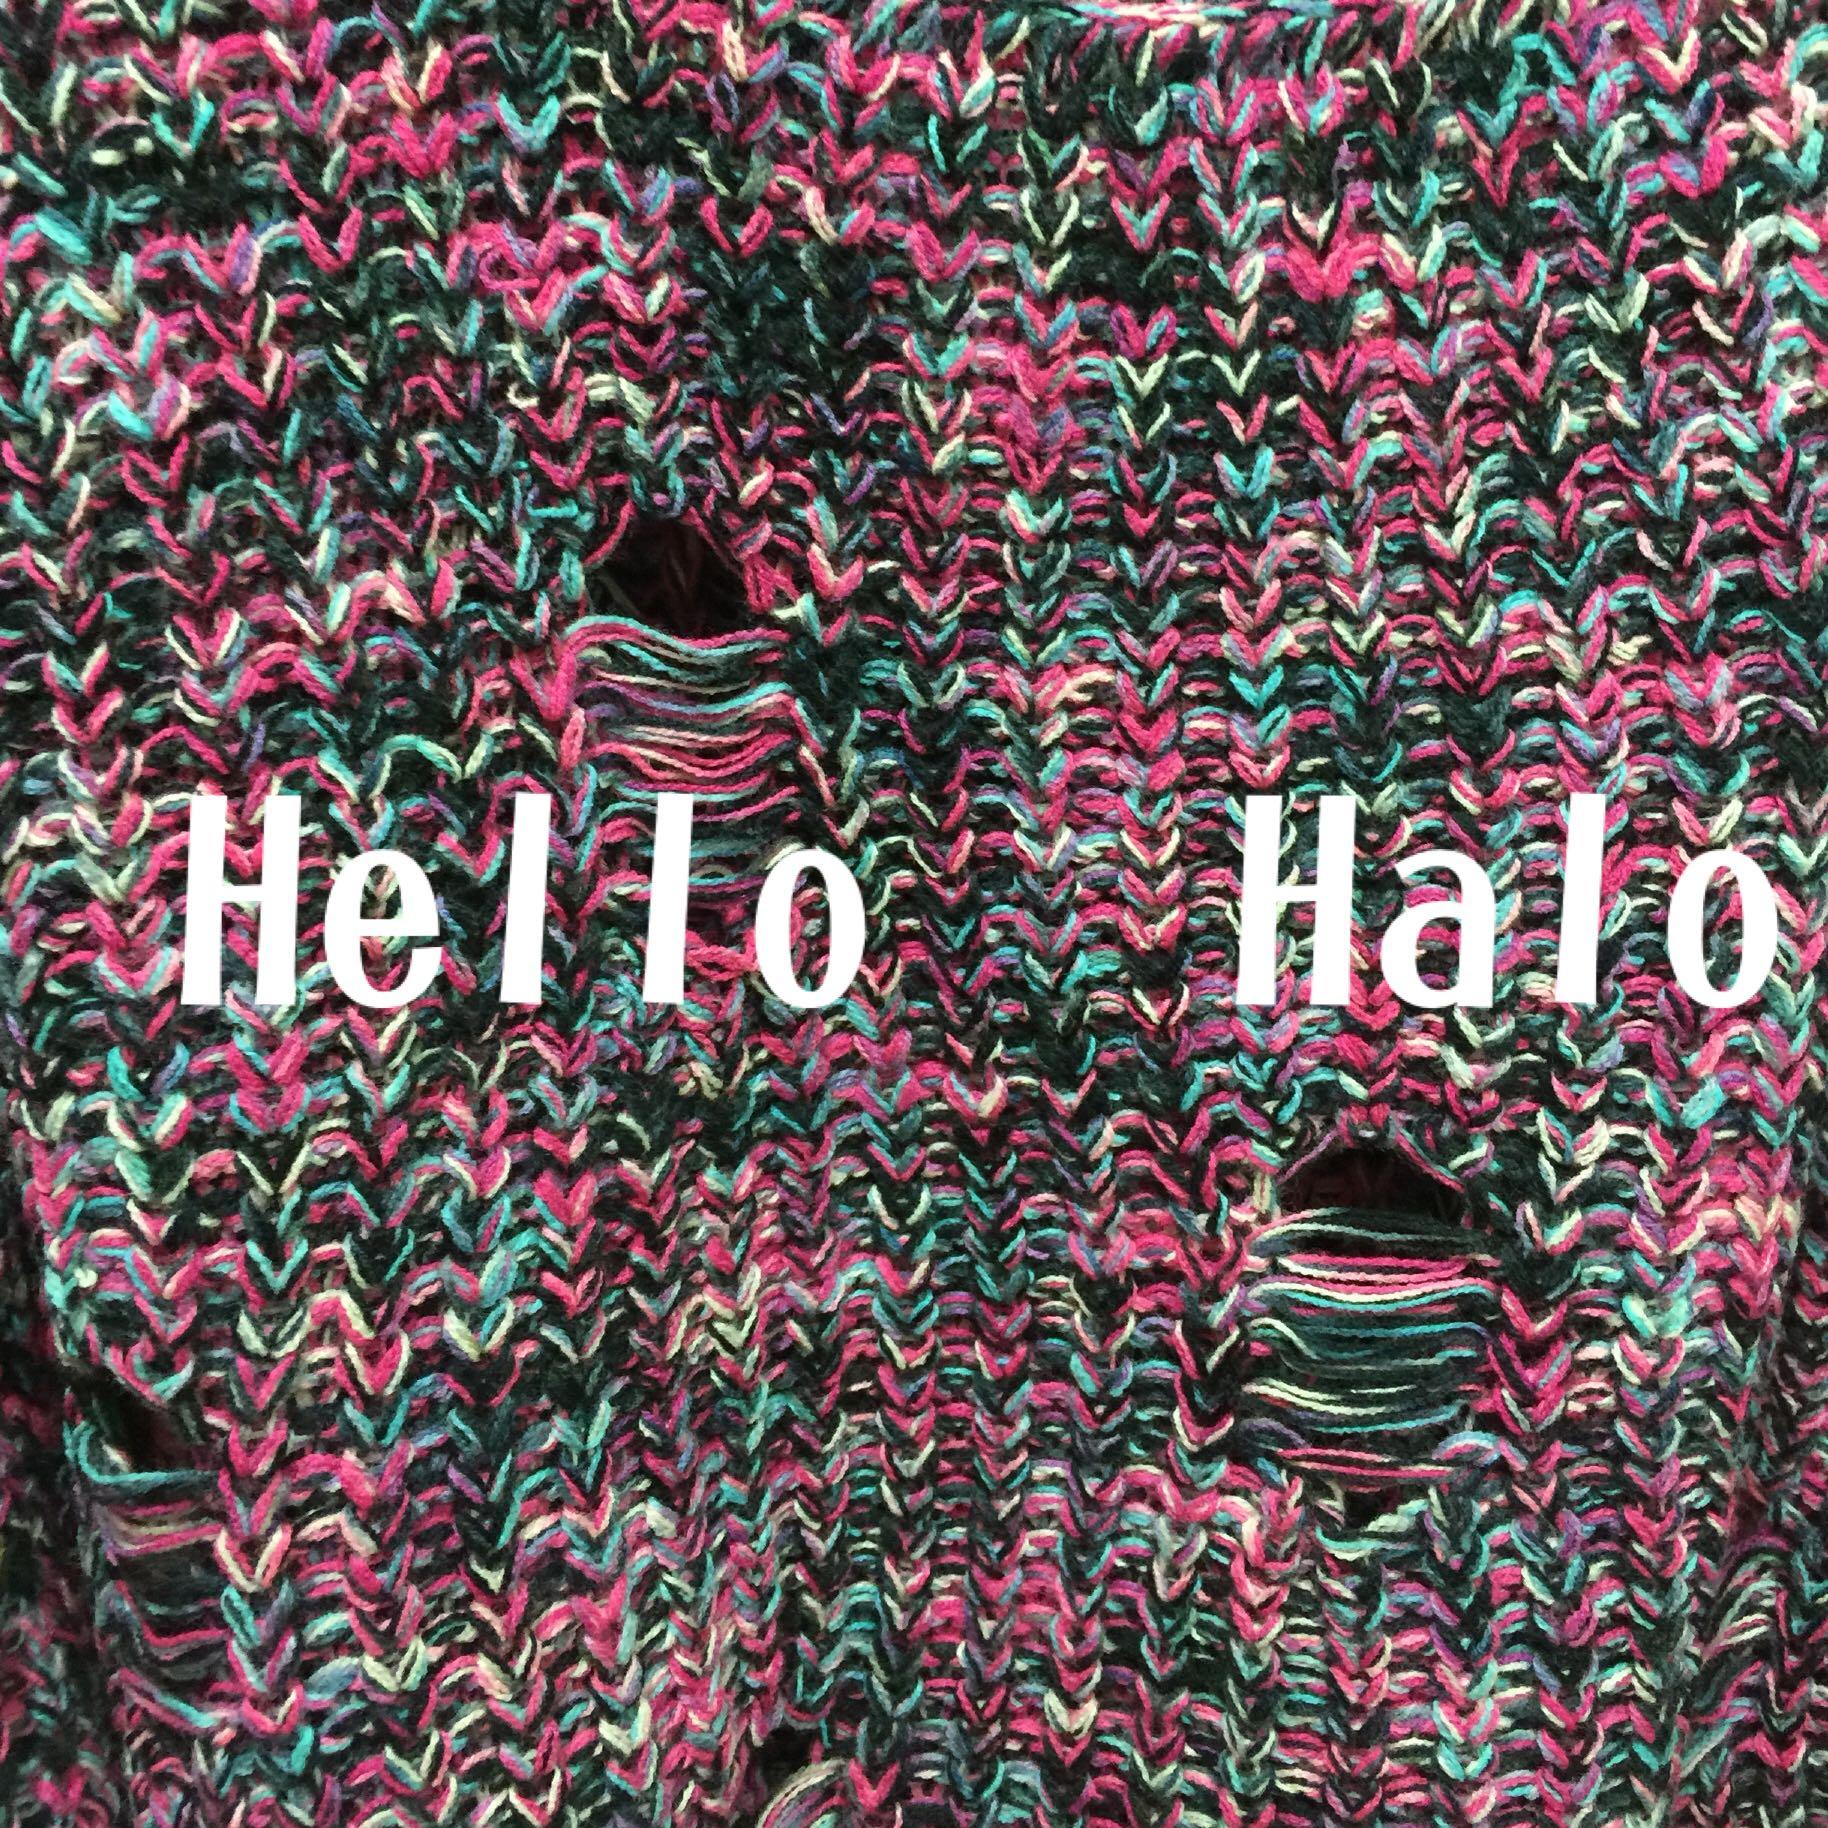 halohello